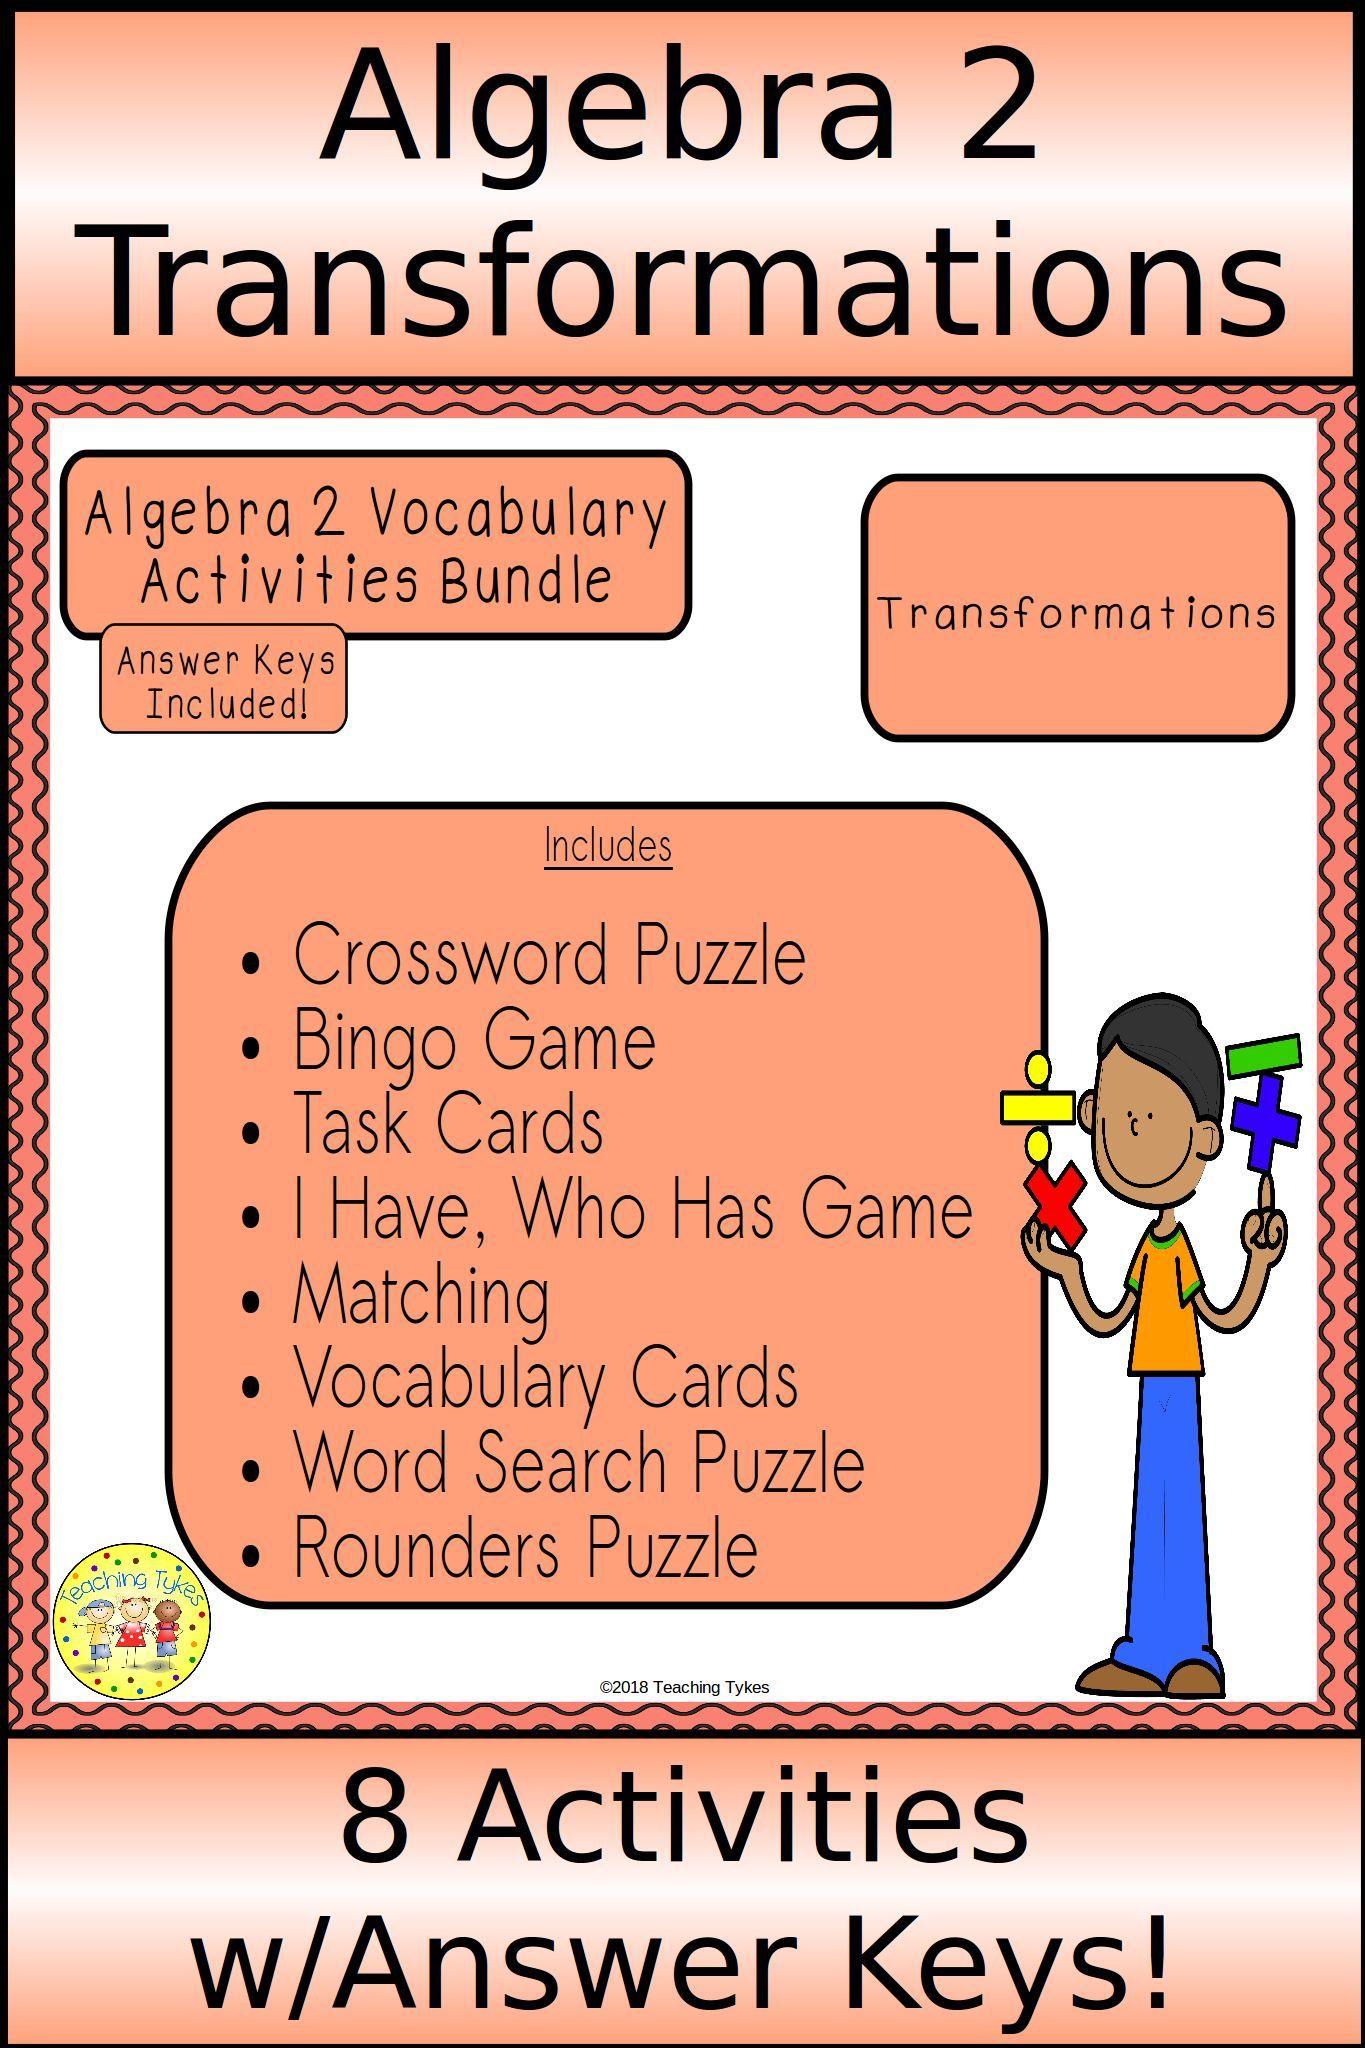 Transformations Algebra 2 Bundle